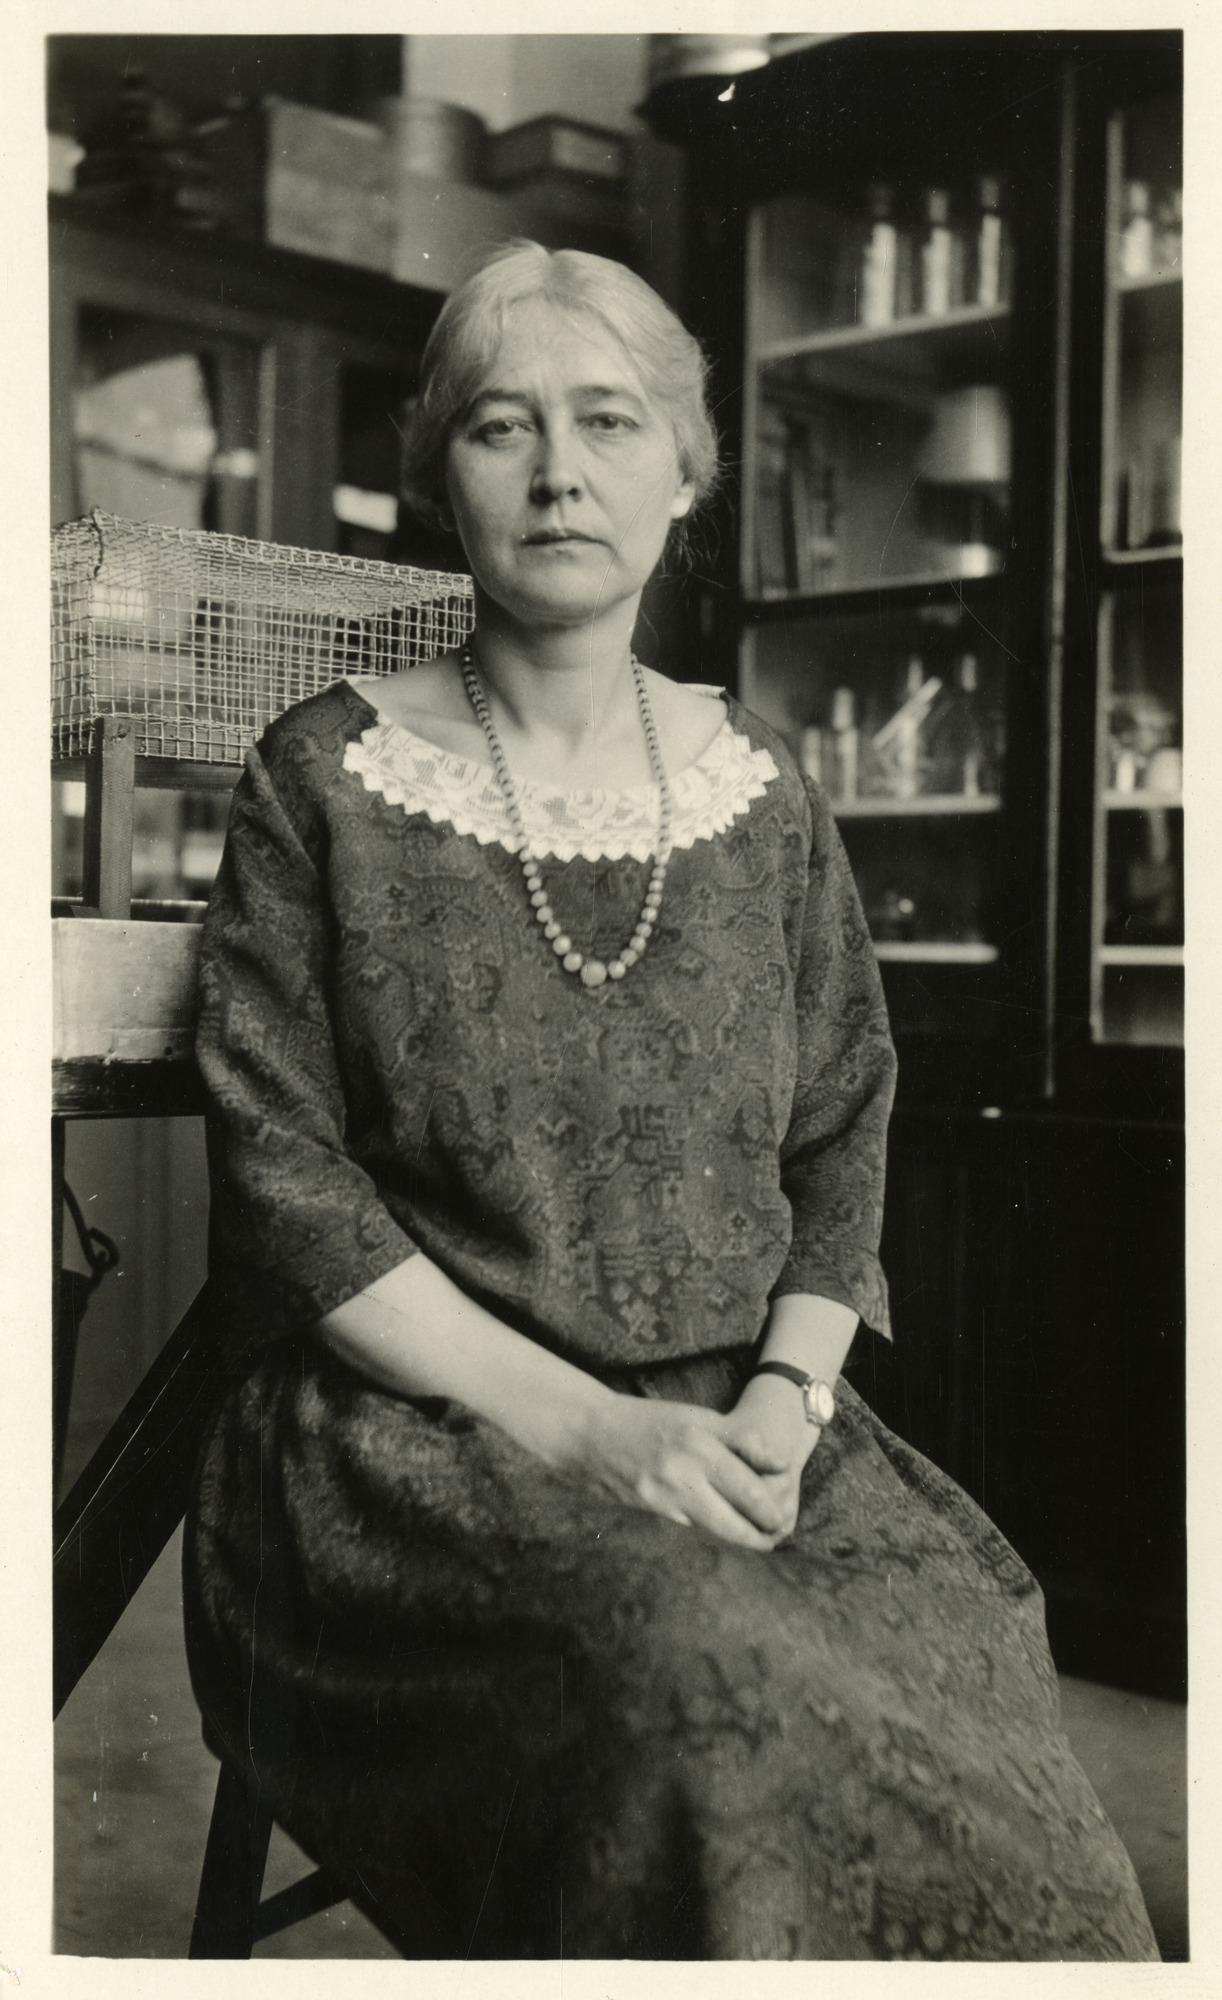 Para Ilmuwan Sains Wanita Yang Layak Dibanggakan I